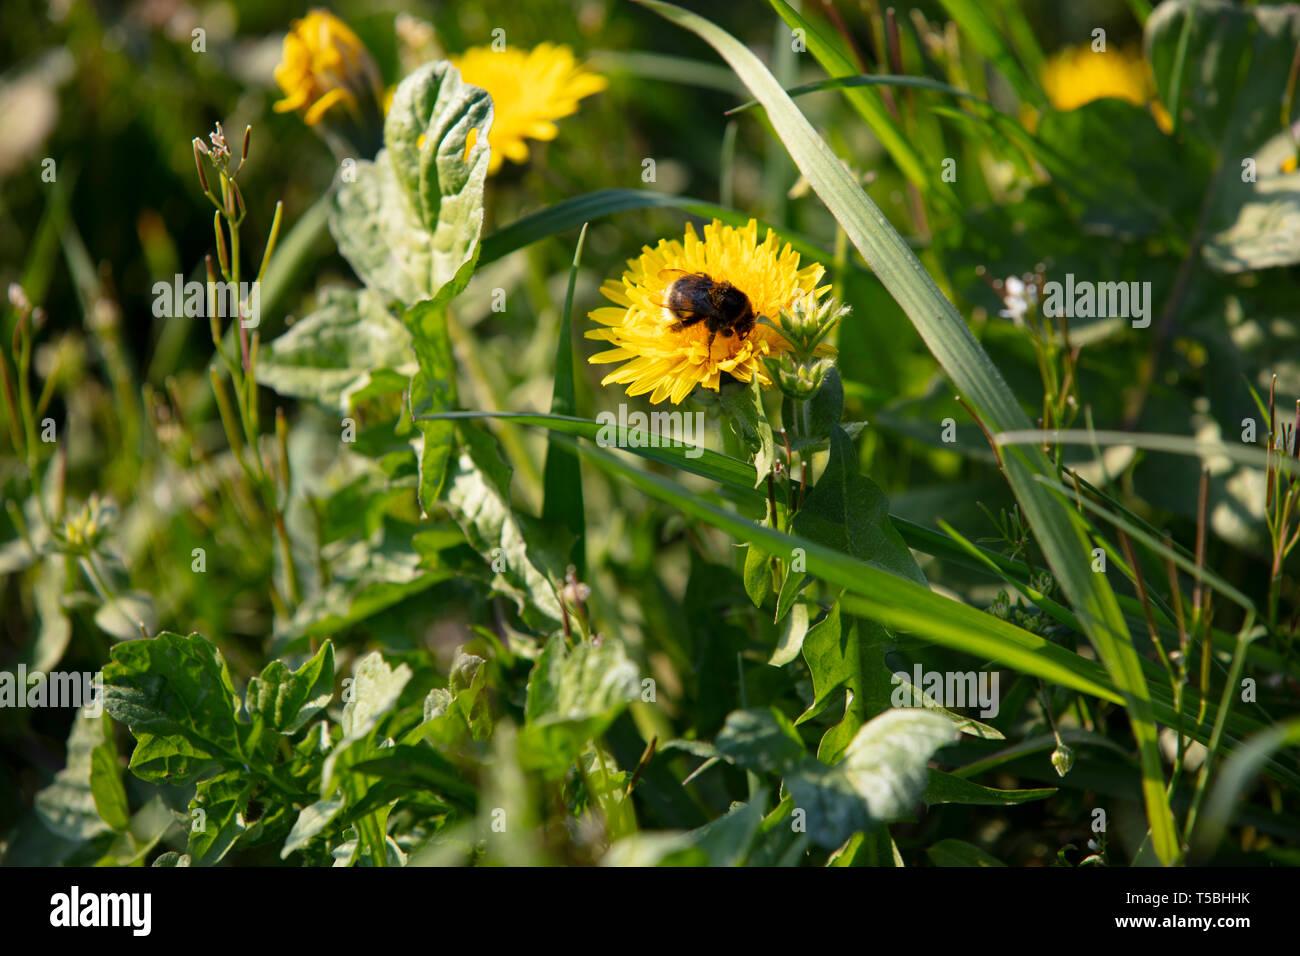 Hummel auf Blume - Stock Image